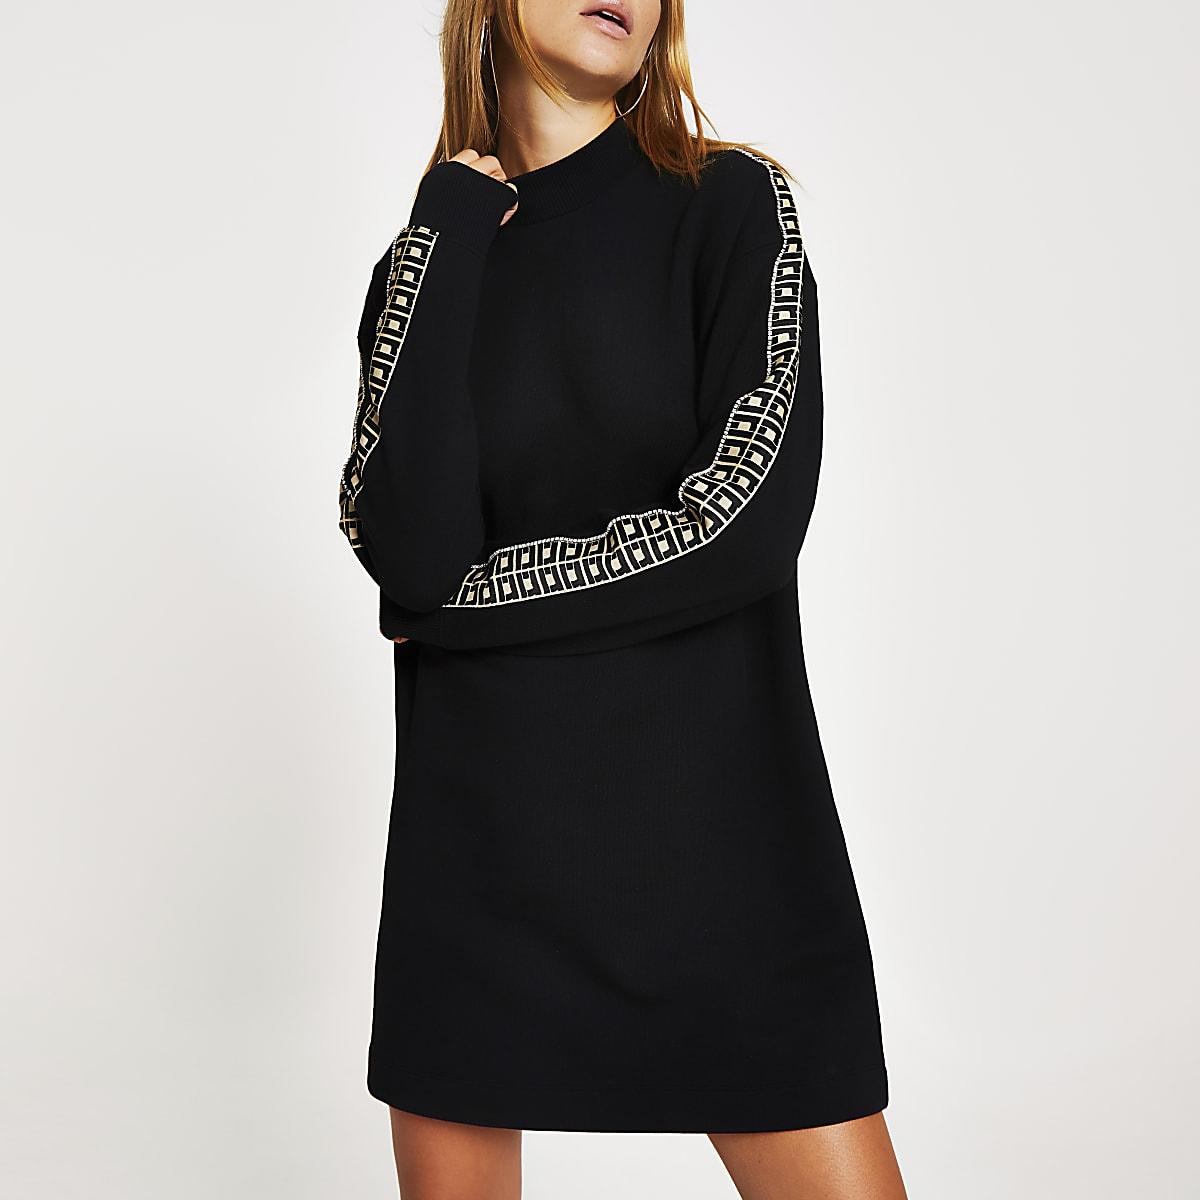 Black RI diamante tape sweatshirt dress